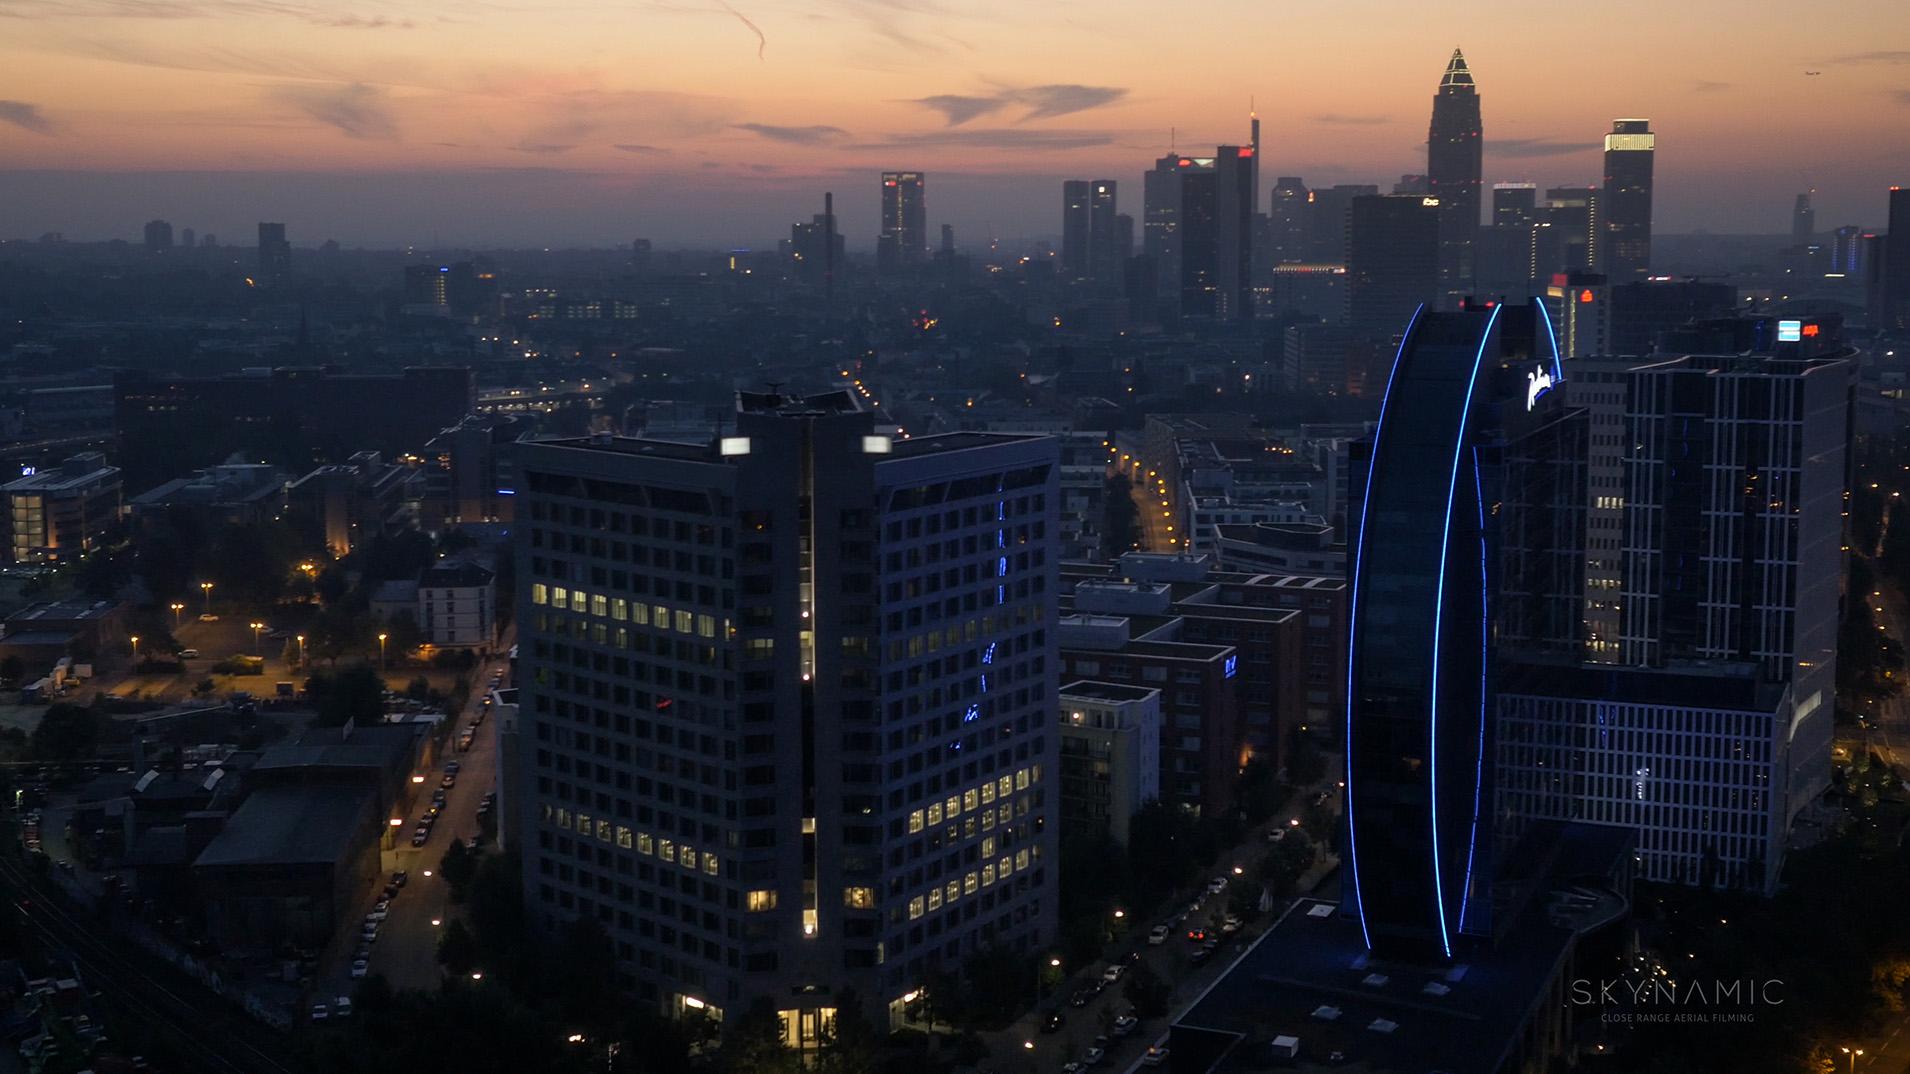 Frankfurt Night Drone Aerial